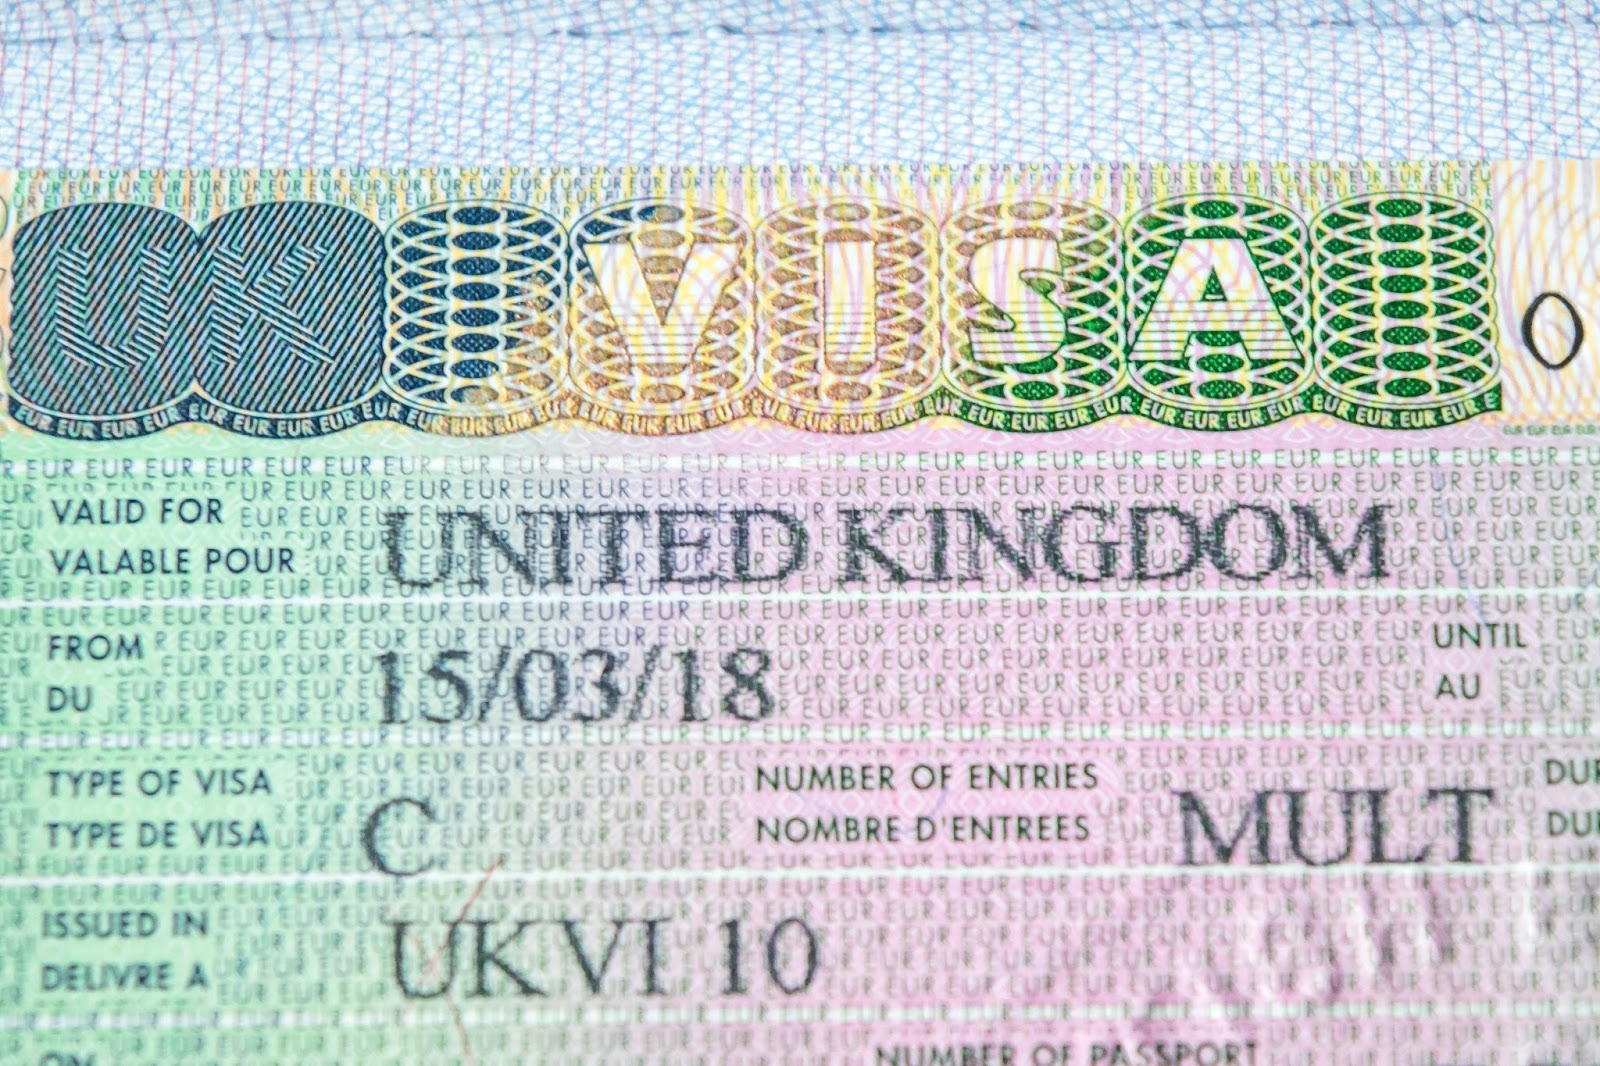 Applying for the Visa - Passport Visas Express